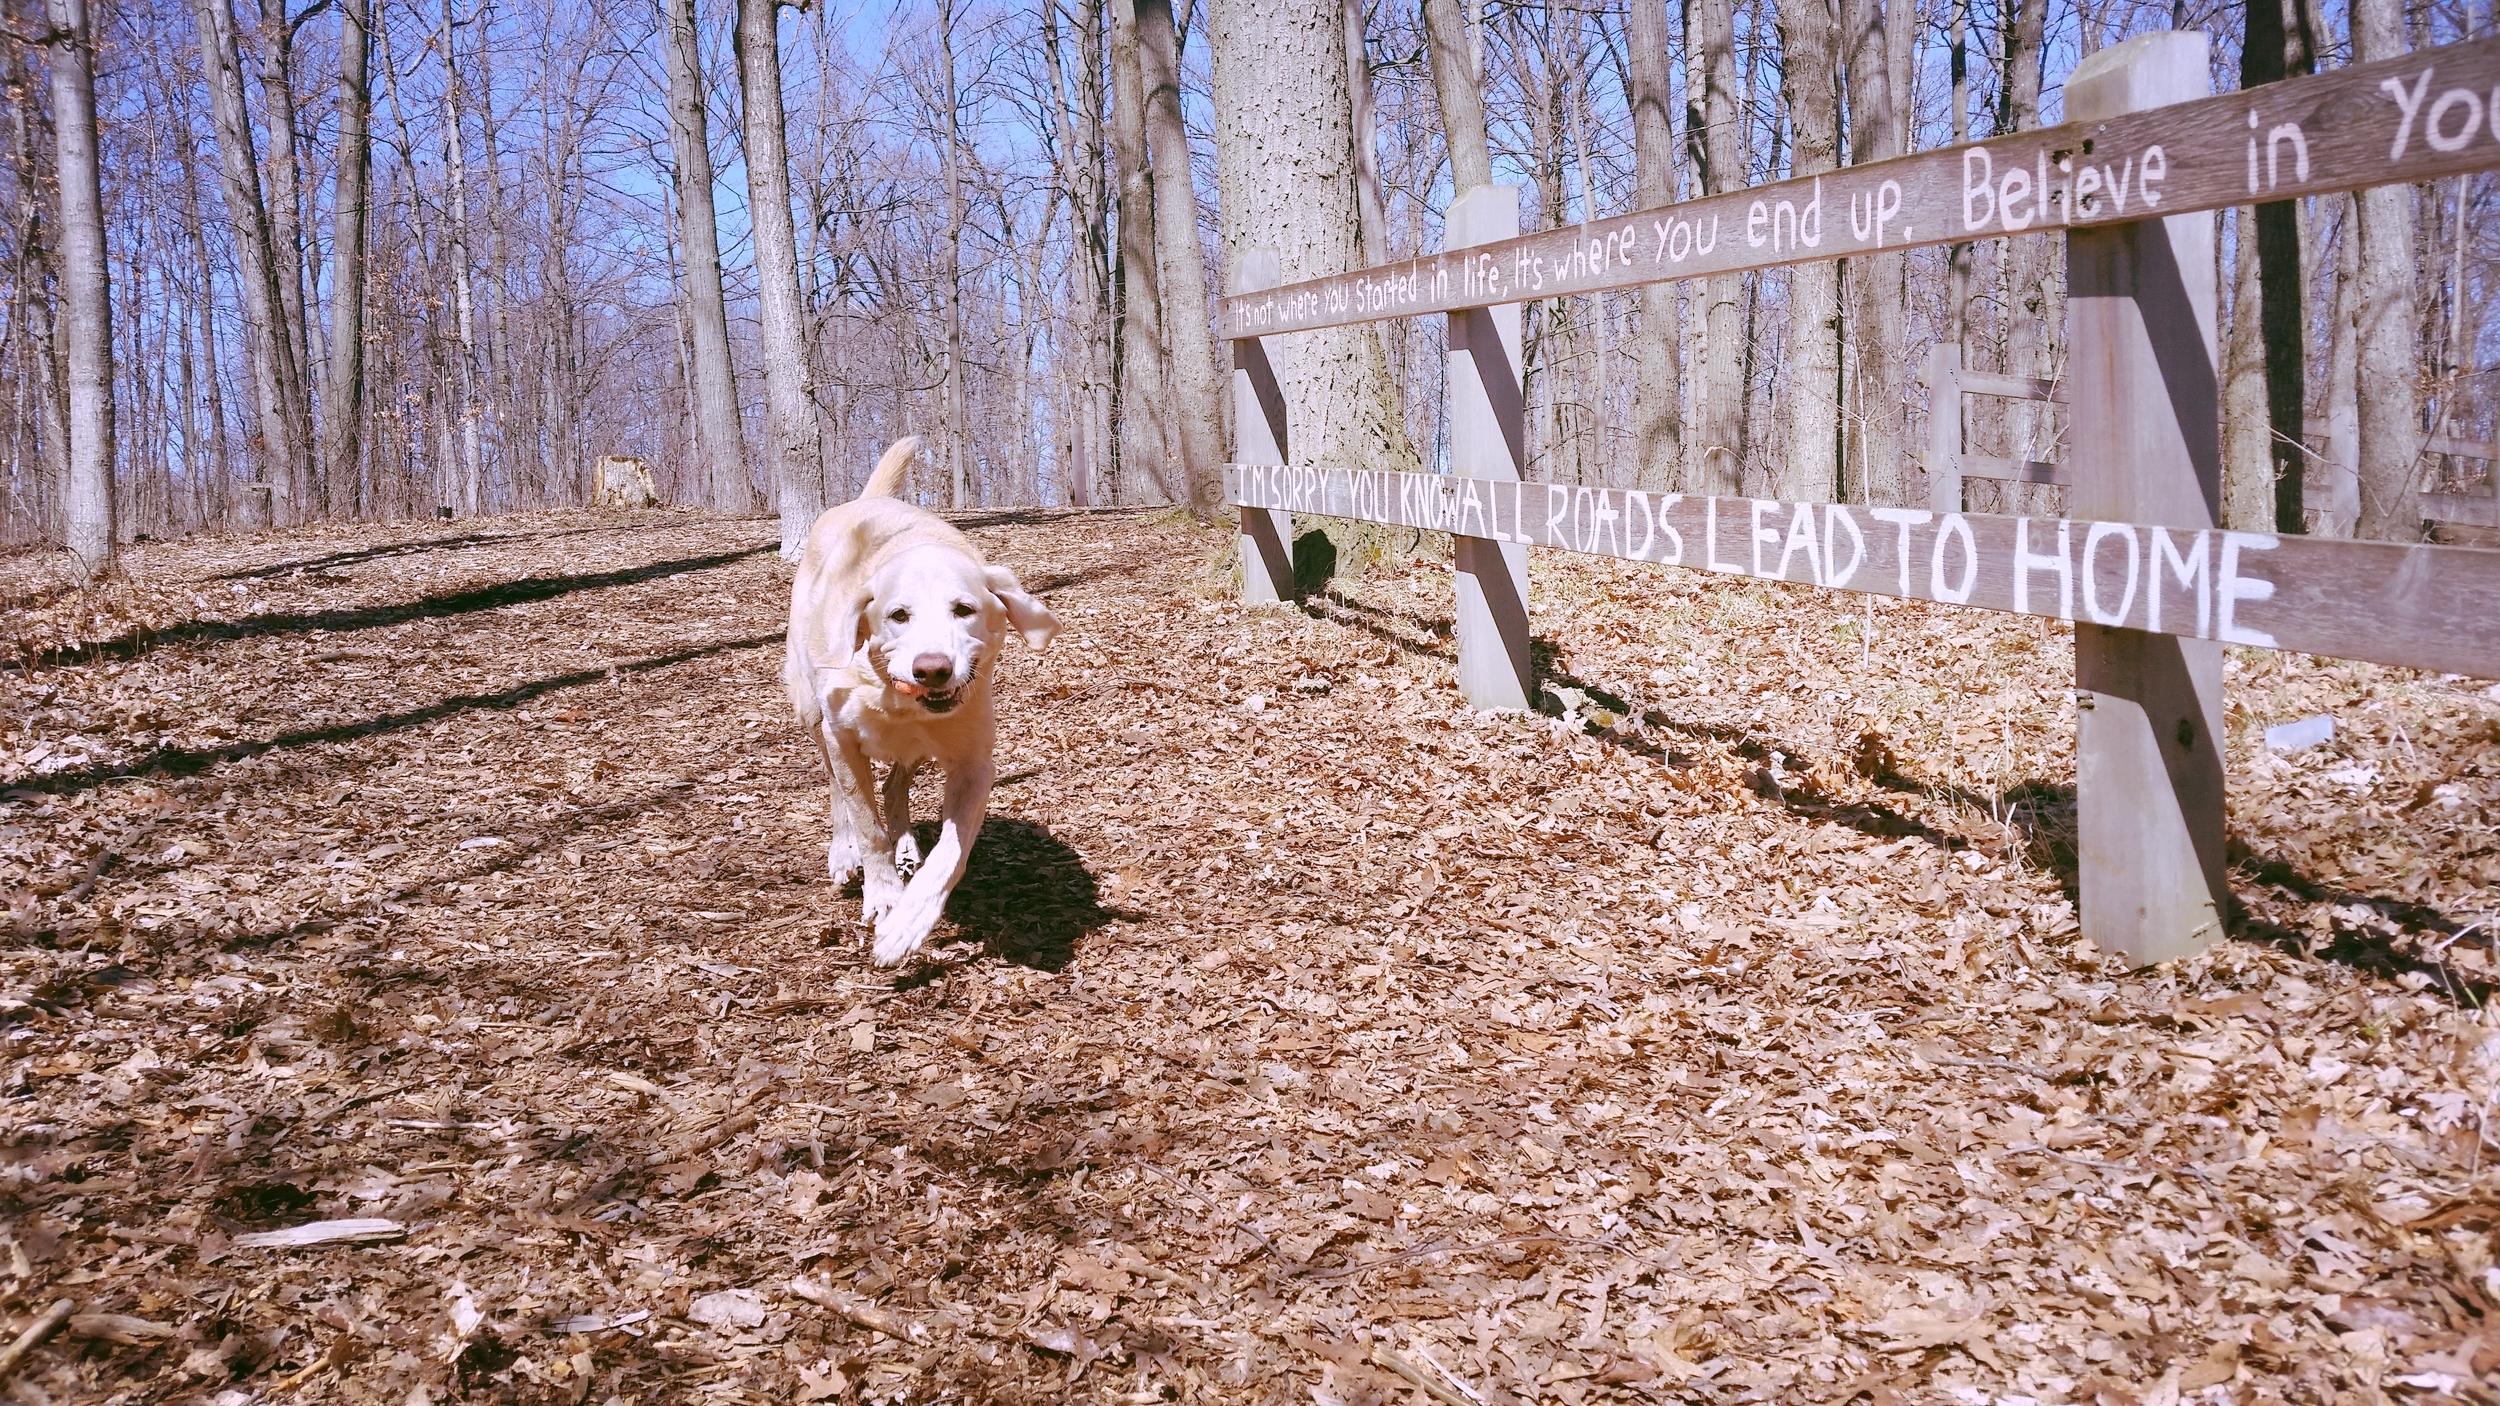 professional pet care services - chau-furr    Learn More